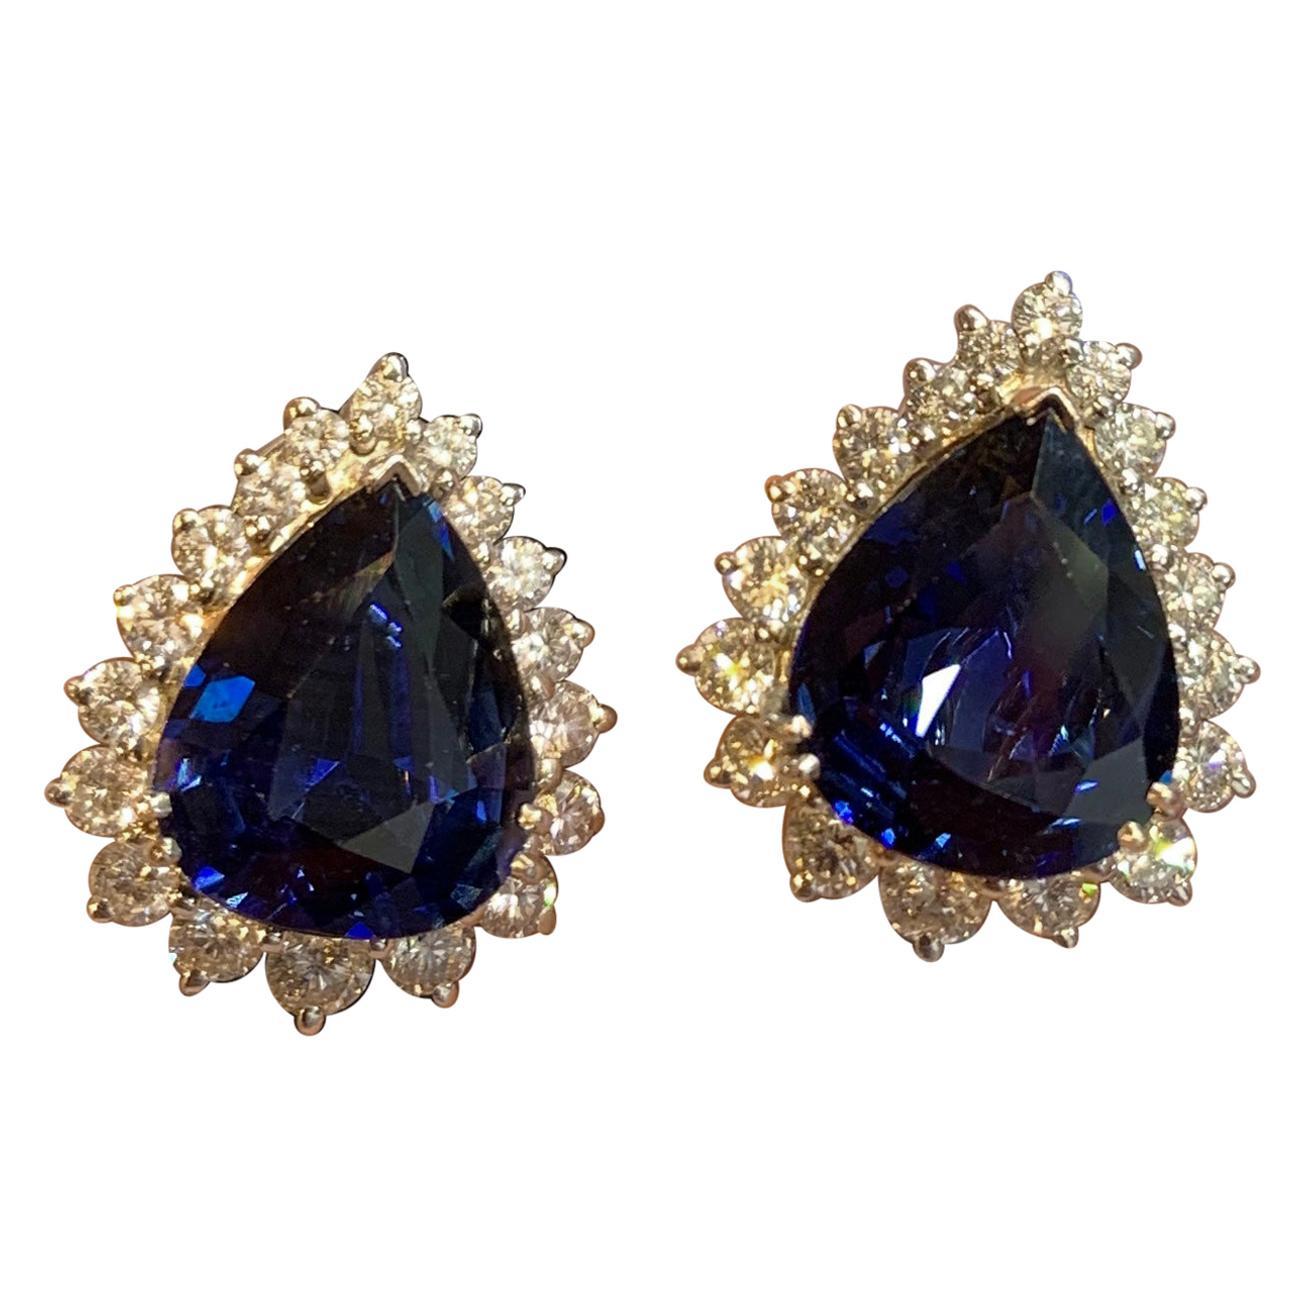 Certified Pear Shape Sapphire and Diamond Earrings